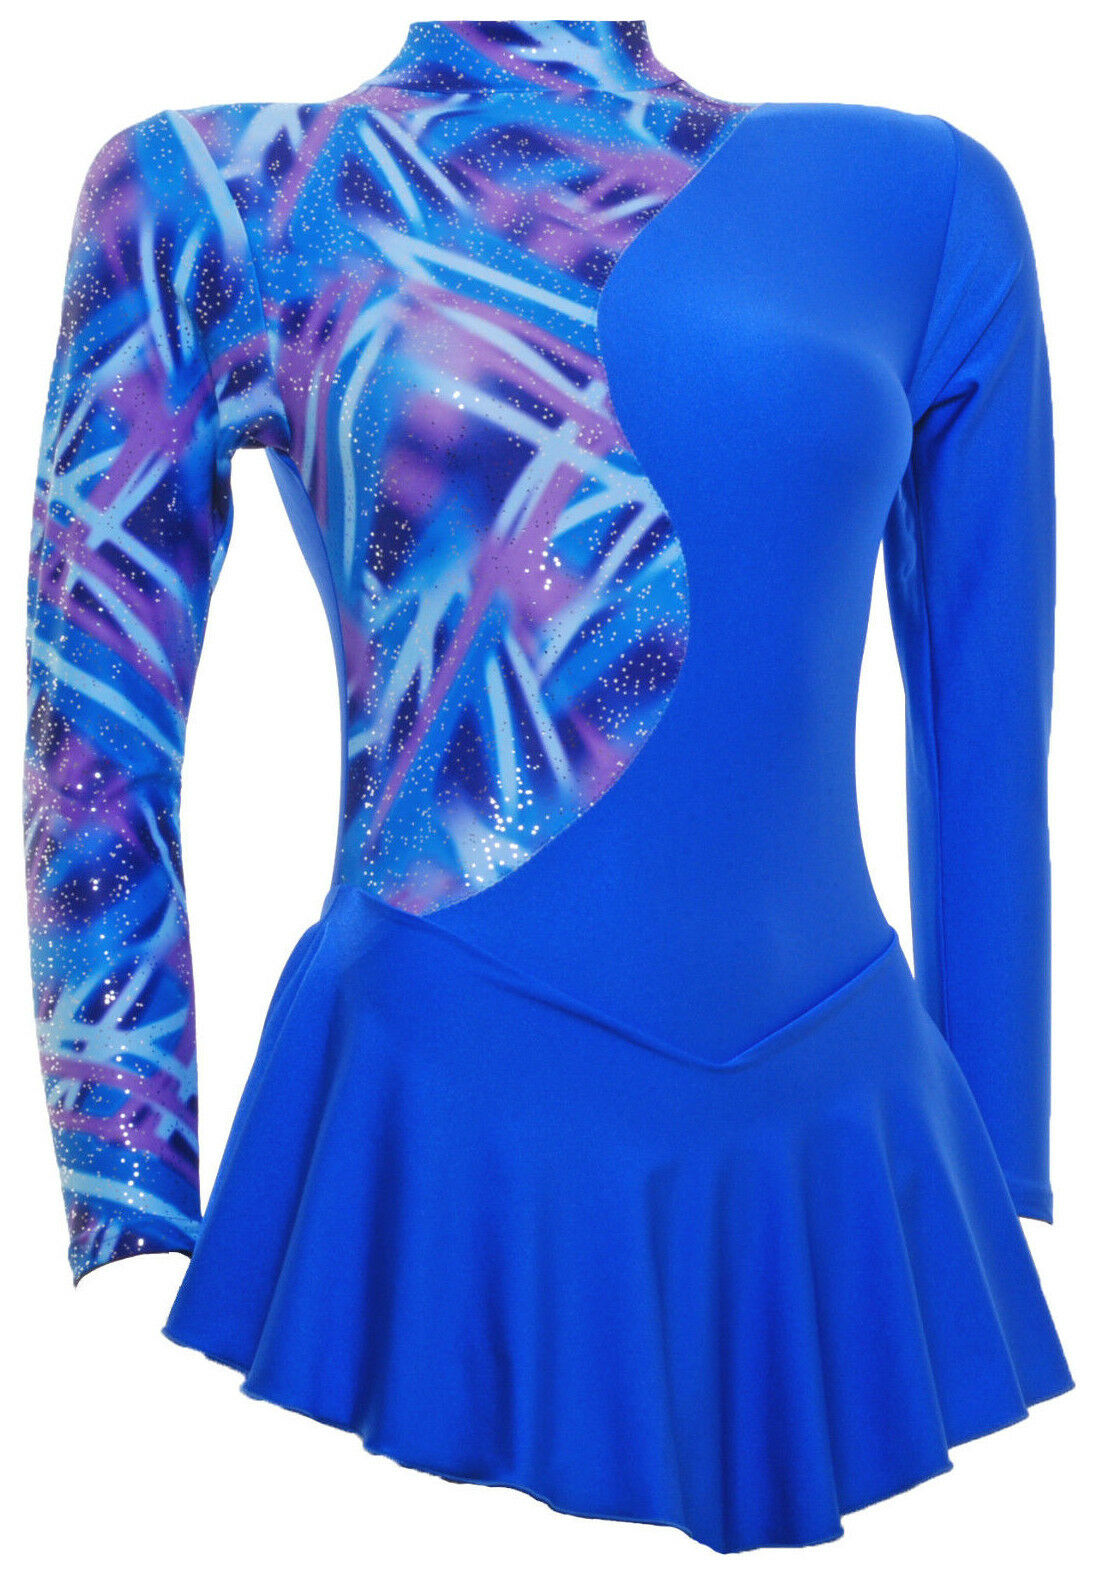 Skating Dress - Royal  bluee Multi Hologram royal bluee Lycra (S1000)  100% price guarantee